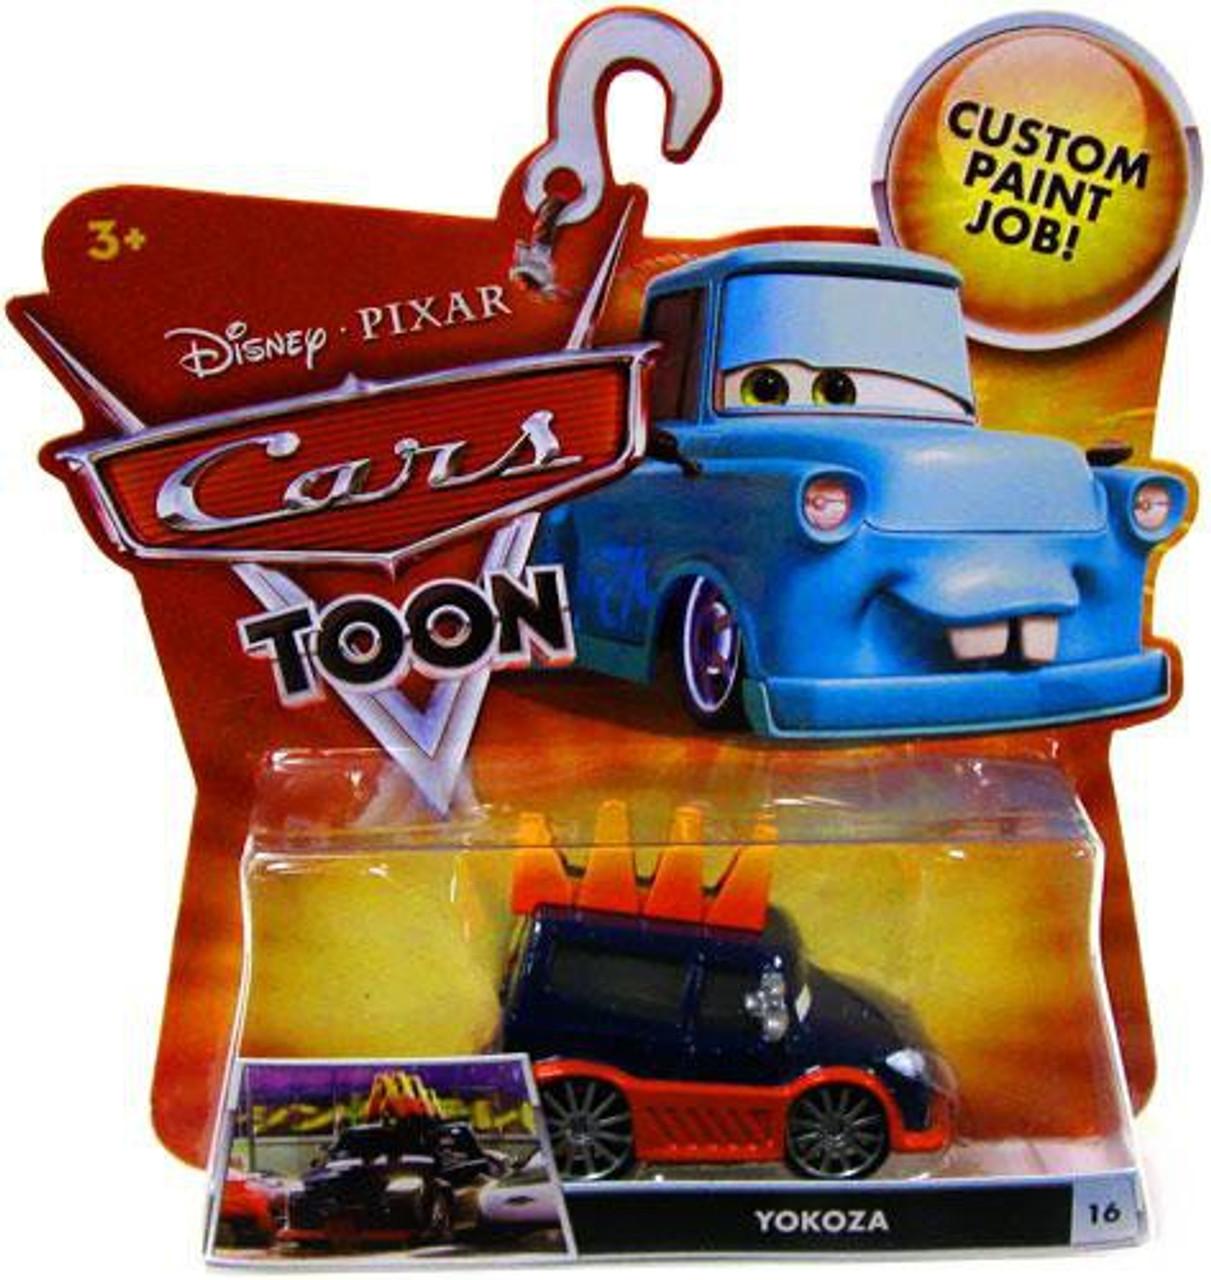 Disney Cars Cars Toon Main Series Yokoza Diecast Car #16